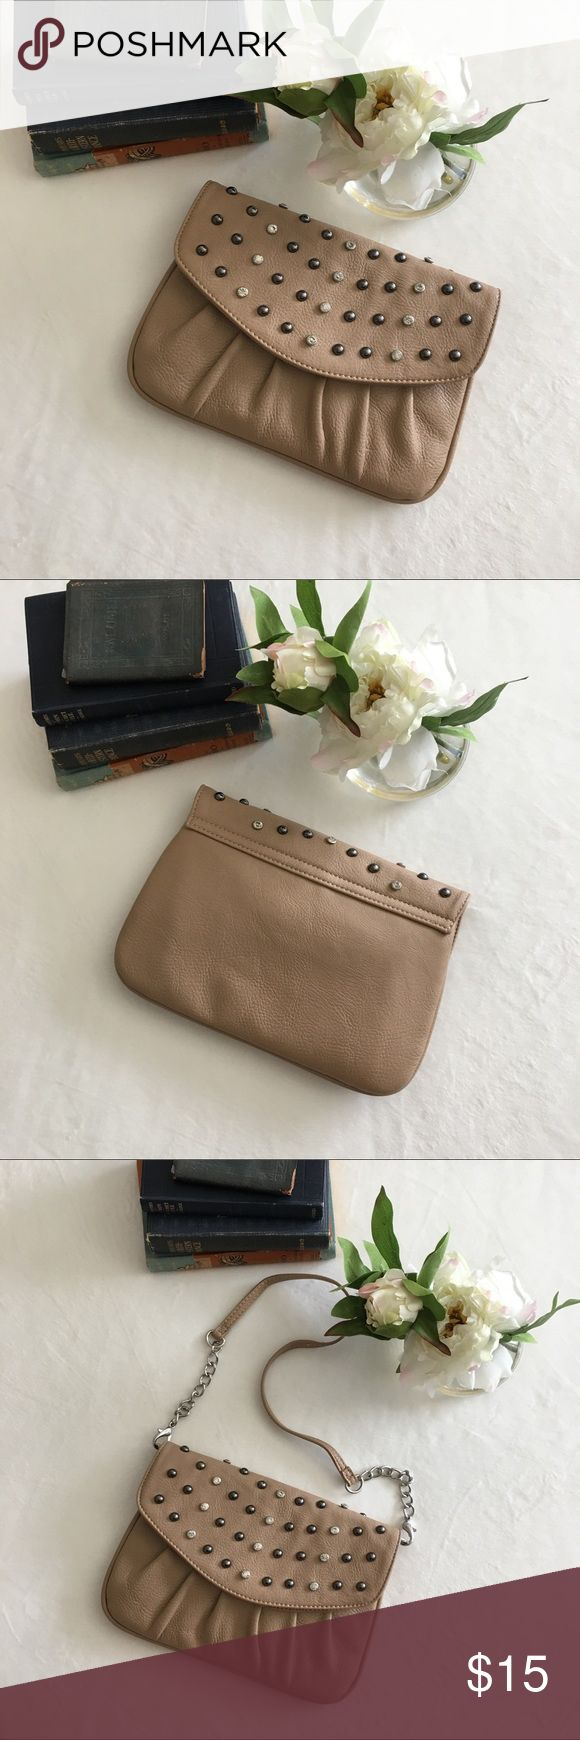 Grace Adele Jeweled Tan Clutch, Wristlet, Purse Grace Adele Jeweled Tan Clutch, Wristlet, Purse  •Excellent condition Bags